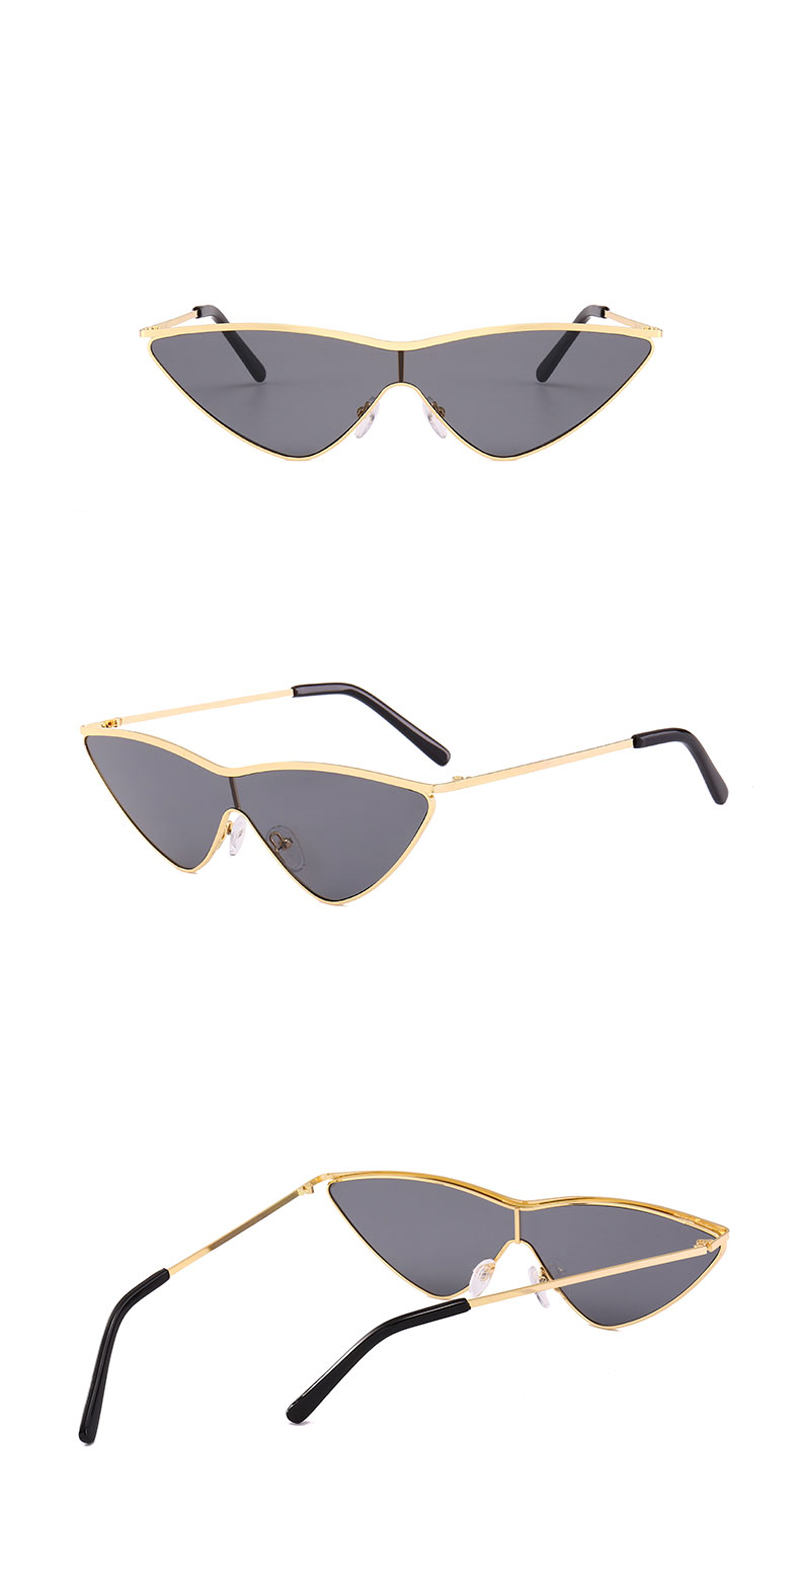 metal cat eye sunglasses women small 0335 details (3)